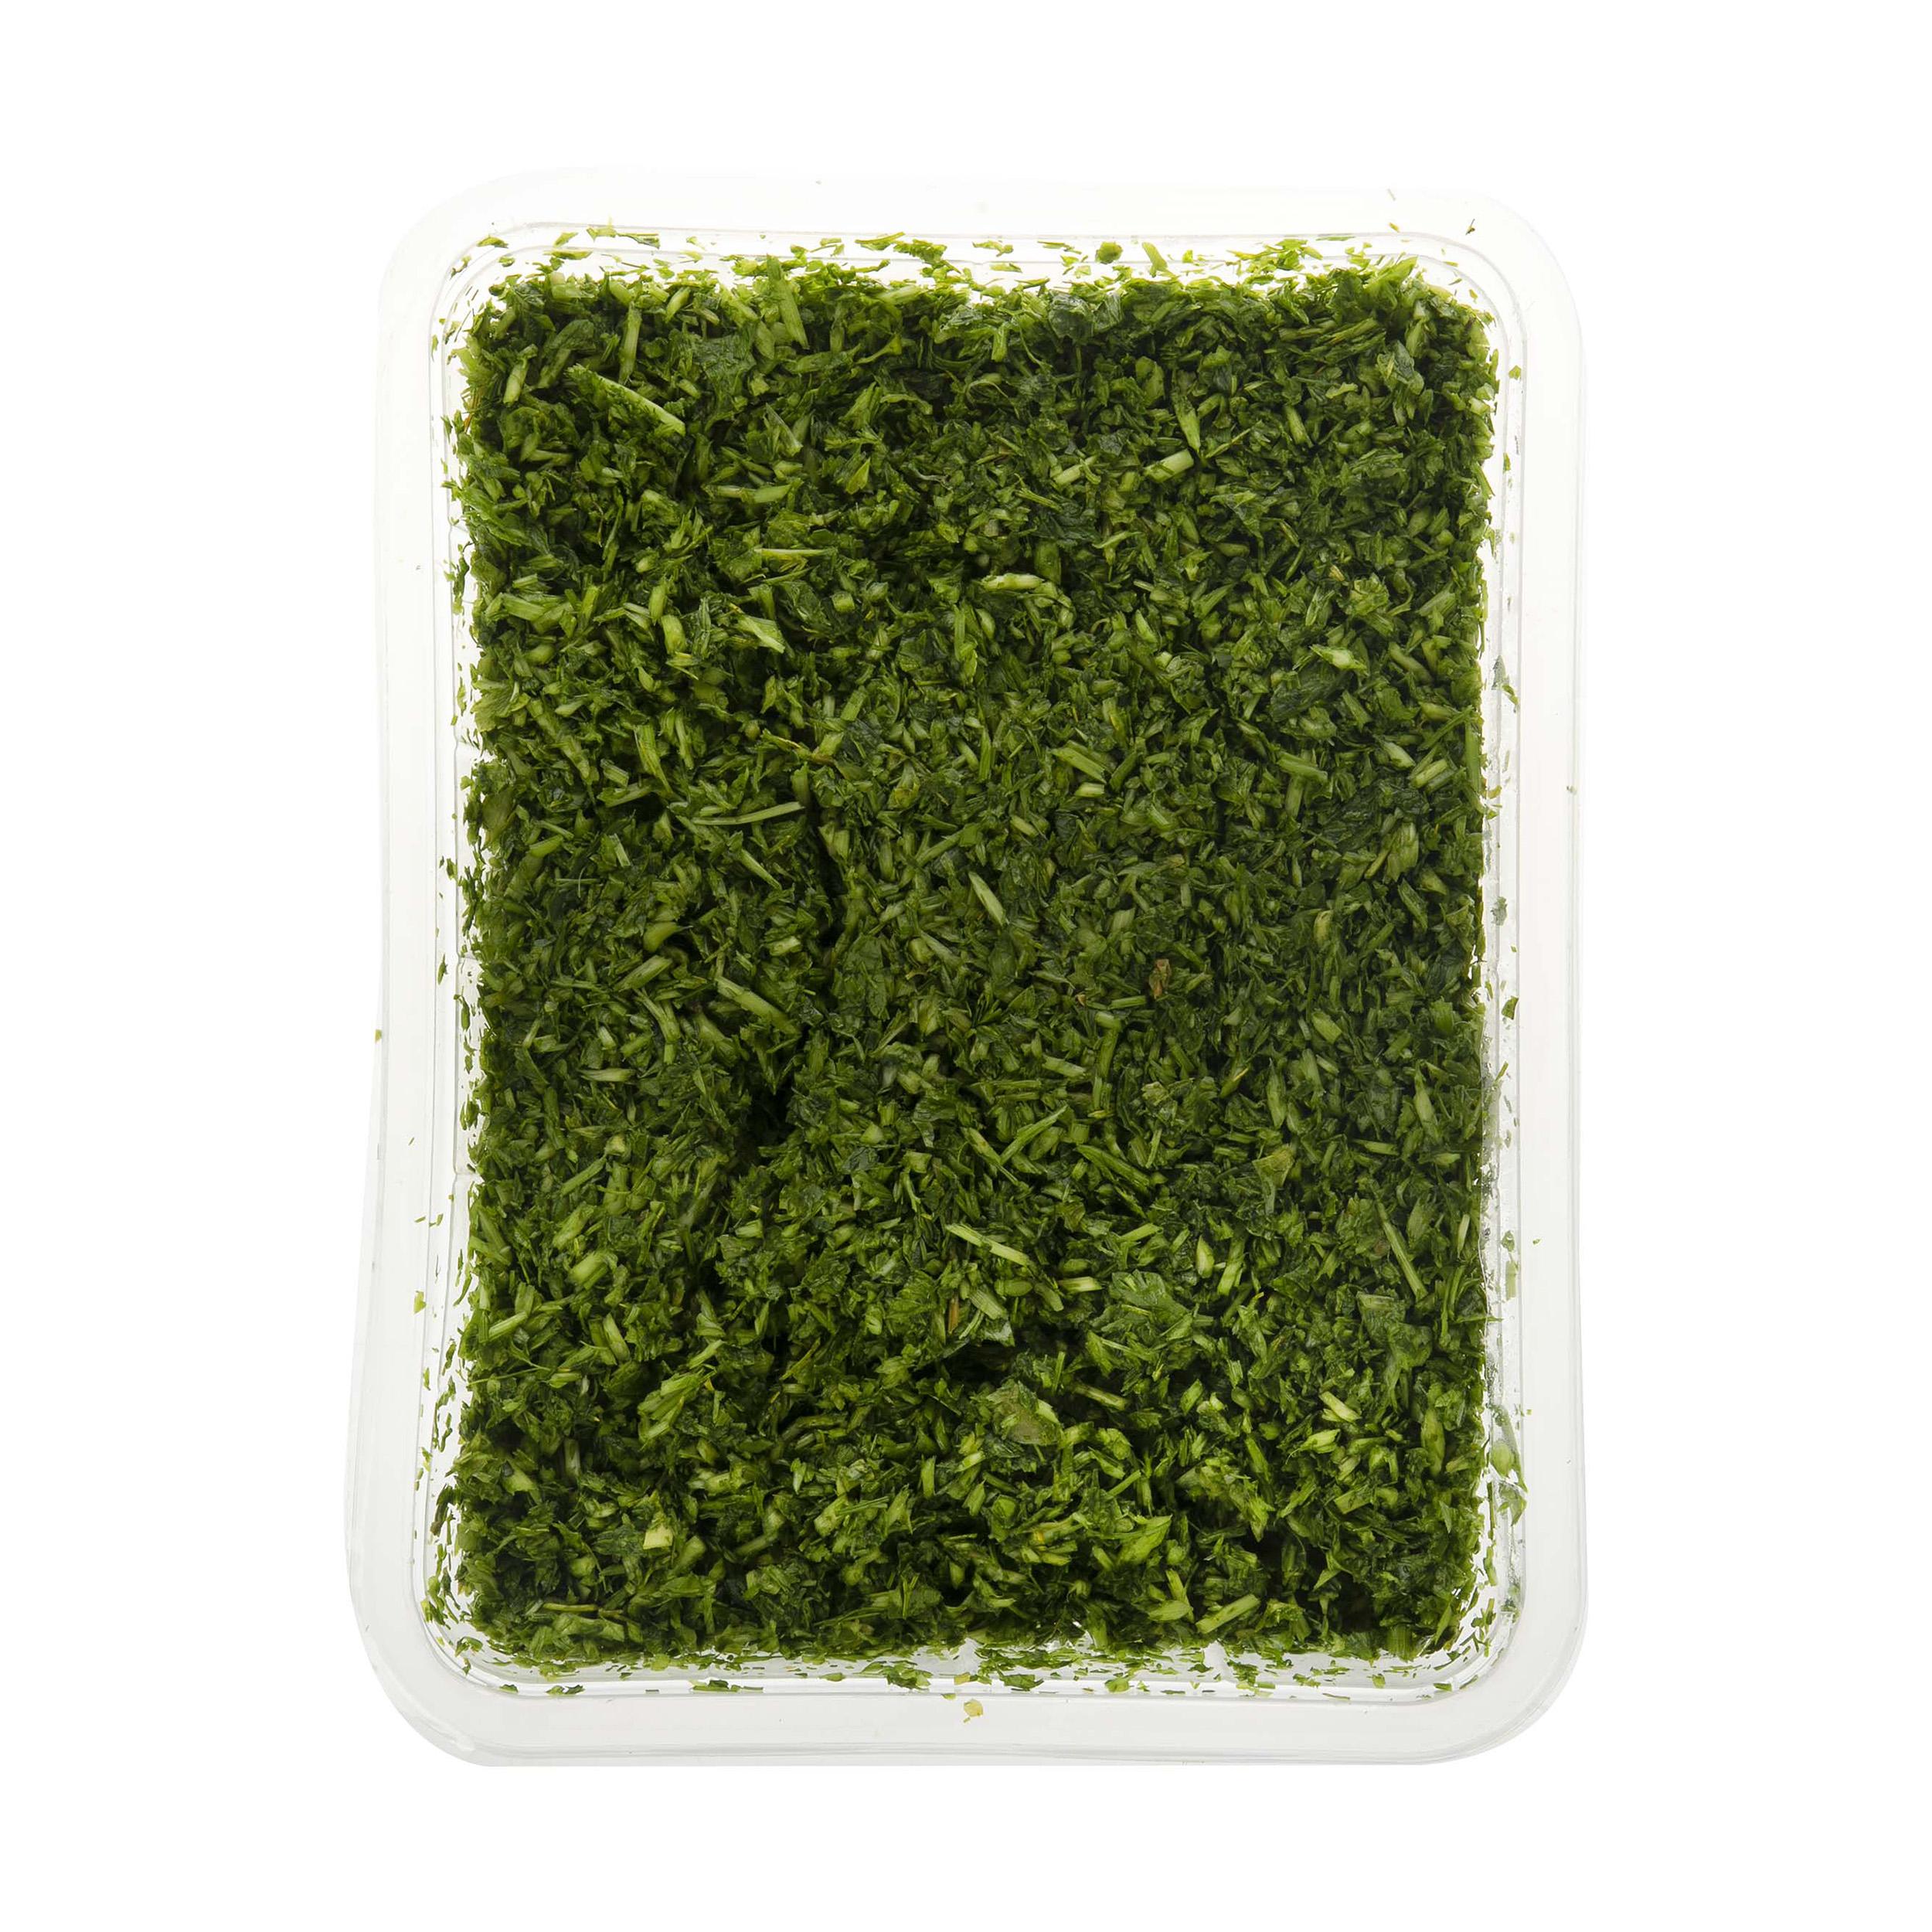 سبزی پلو آلاگون مقدار 500 گرم